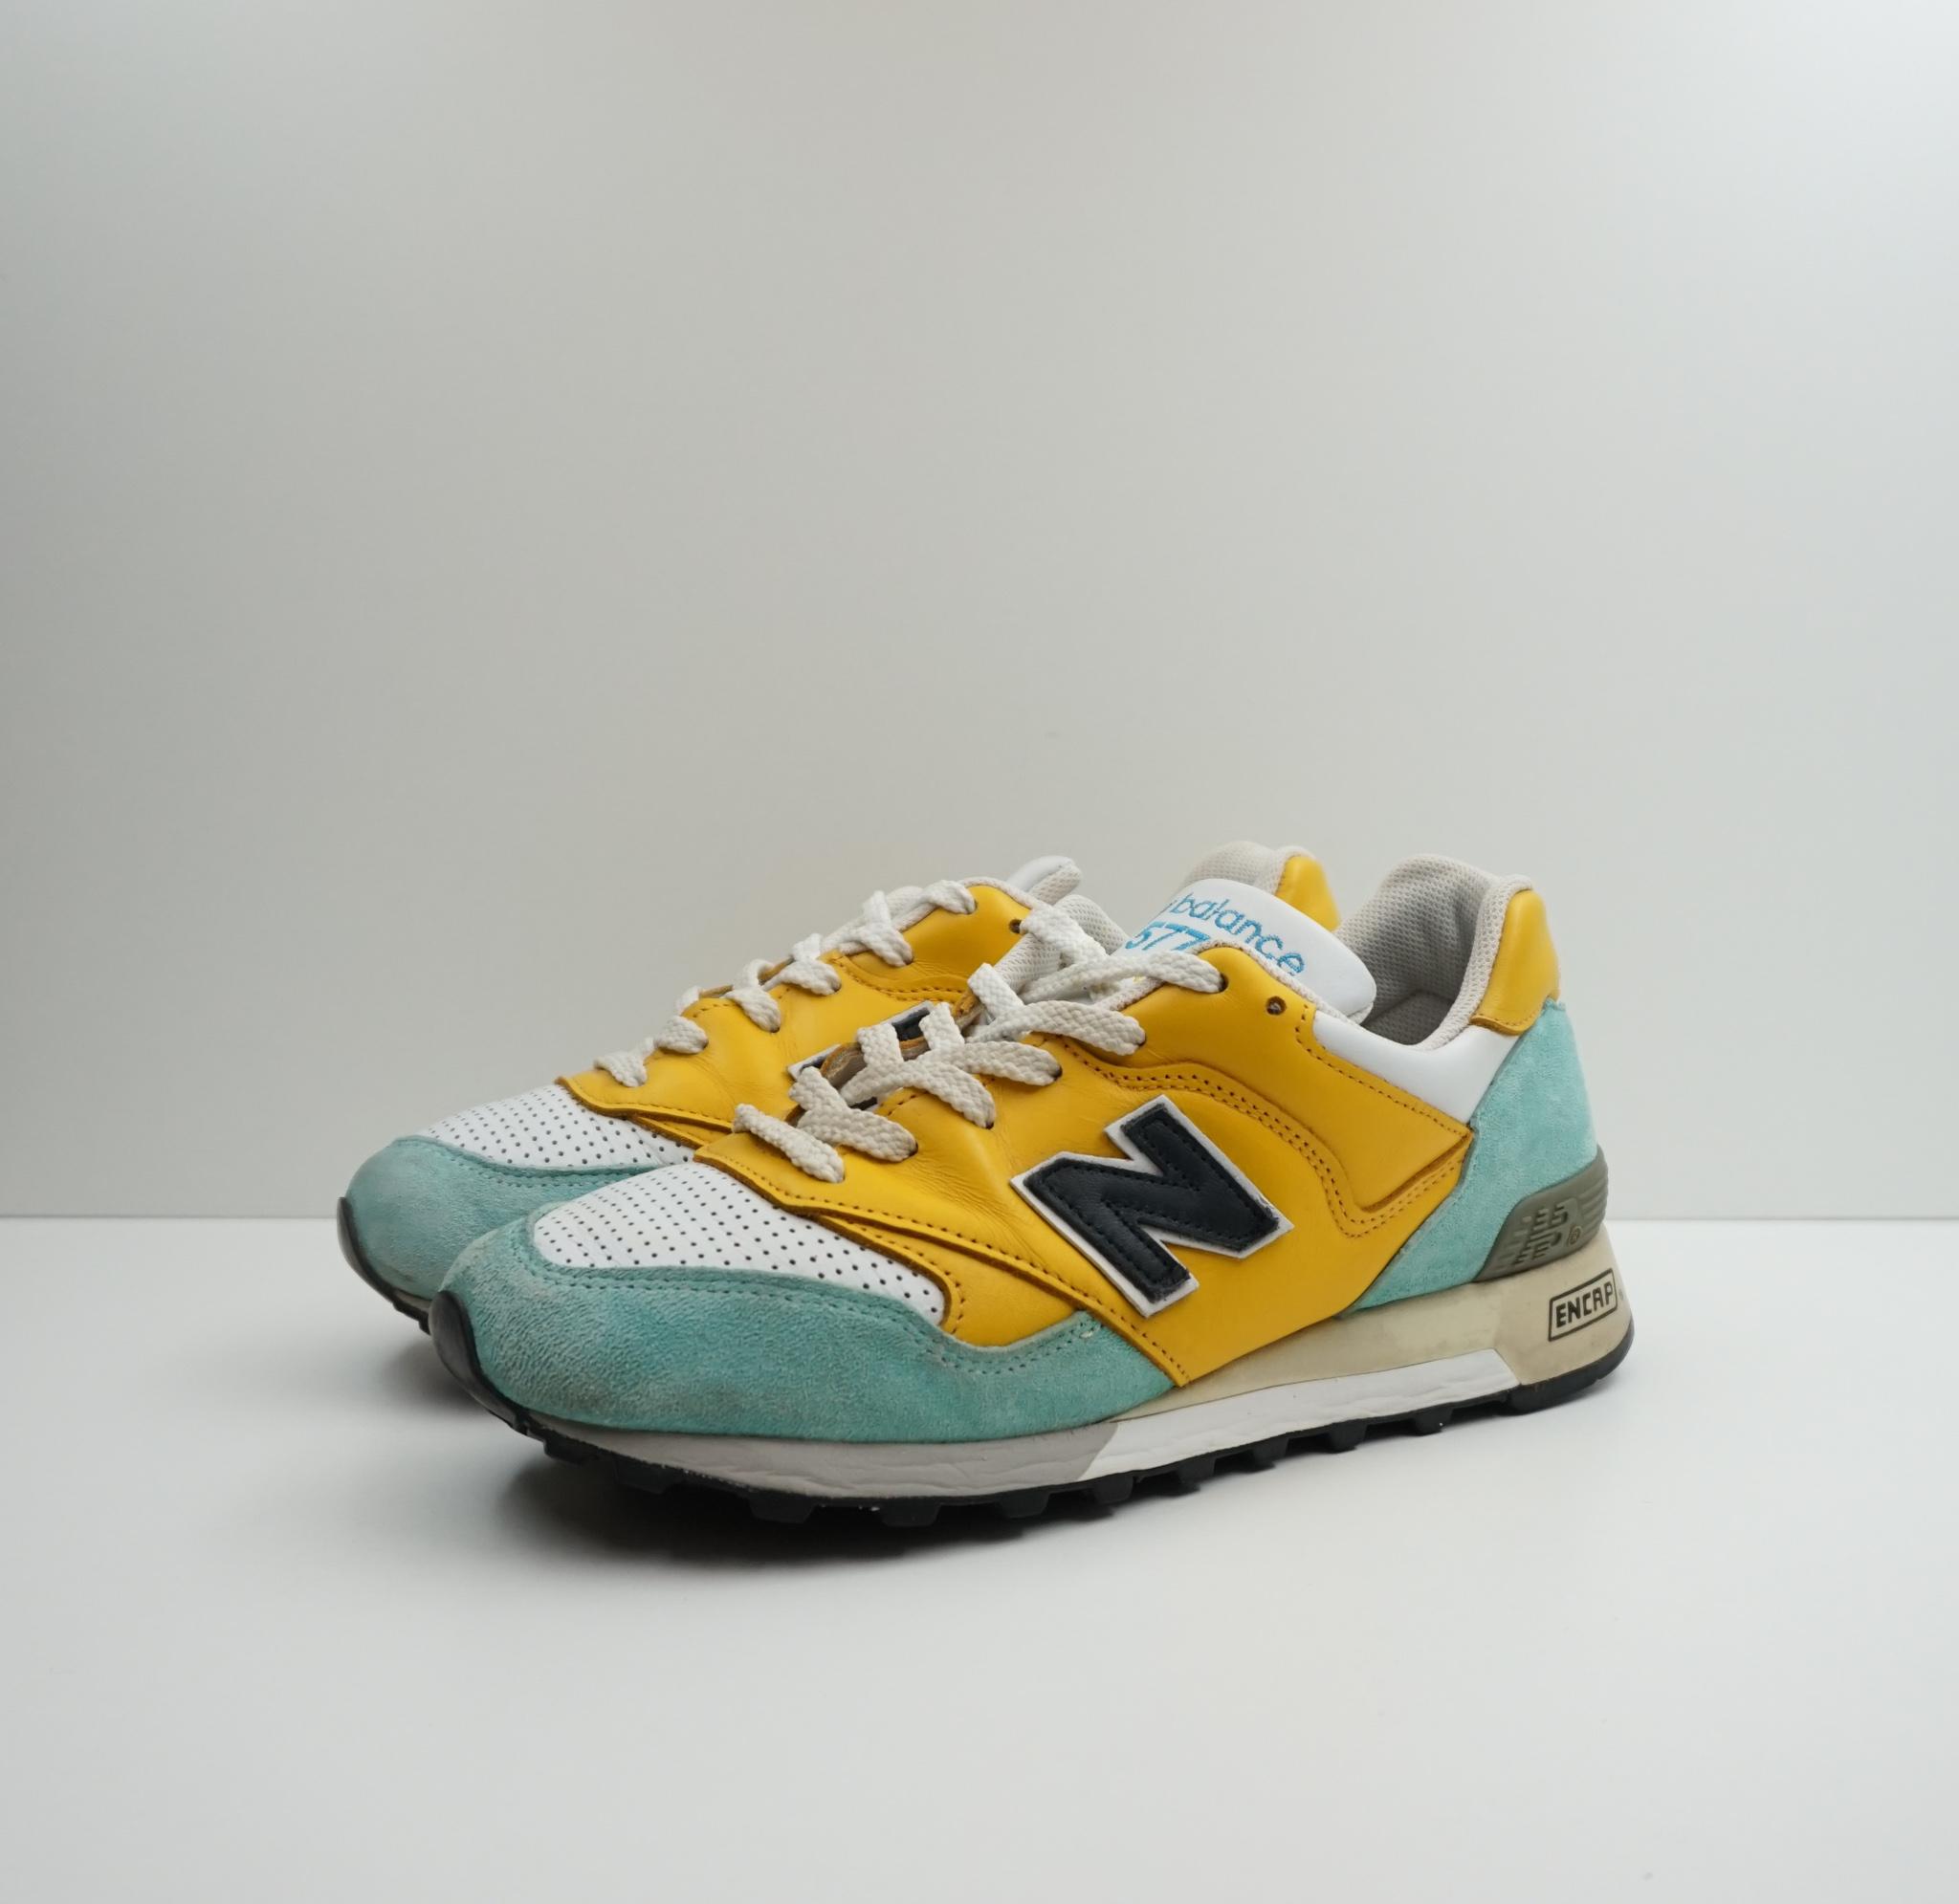 New Balance 577 SNS1 x Sneakersnstuff